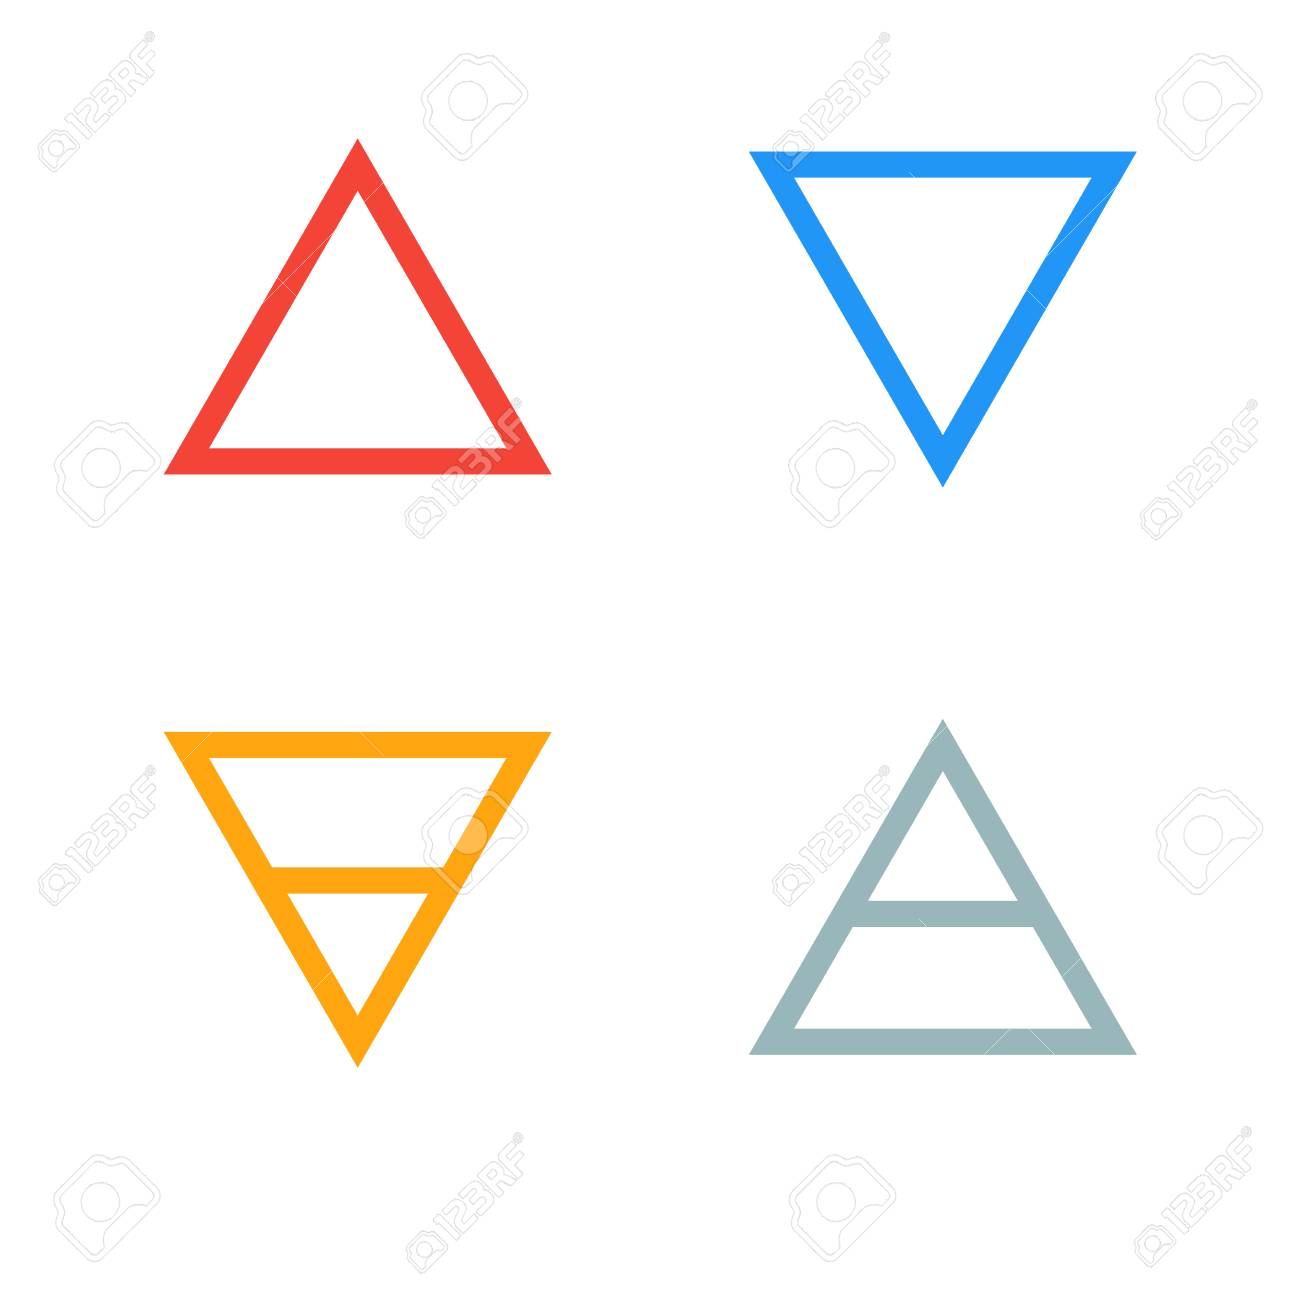 Raster Illustration Of Four Elements Icons Triangle Icons Symbols